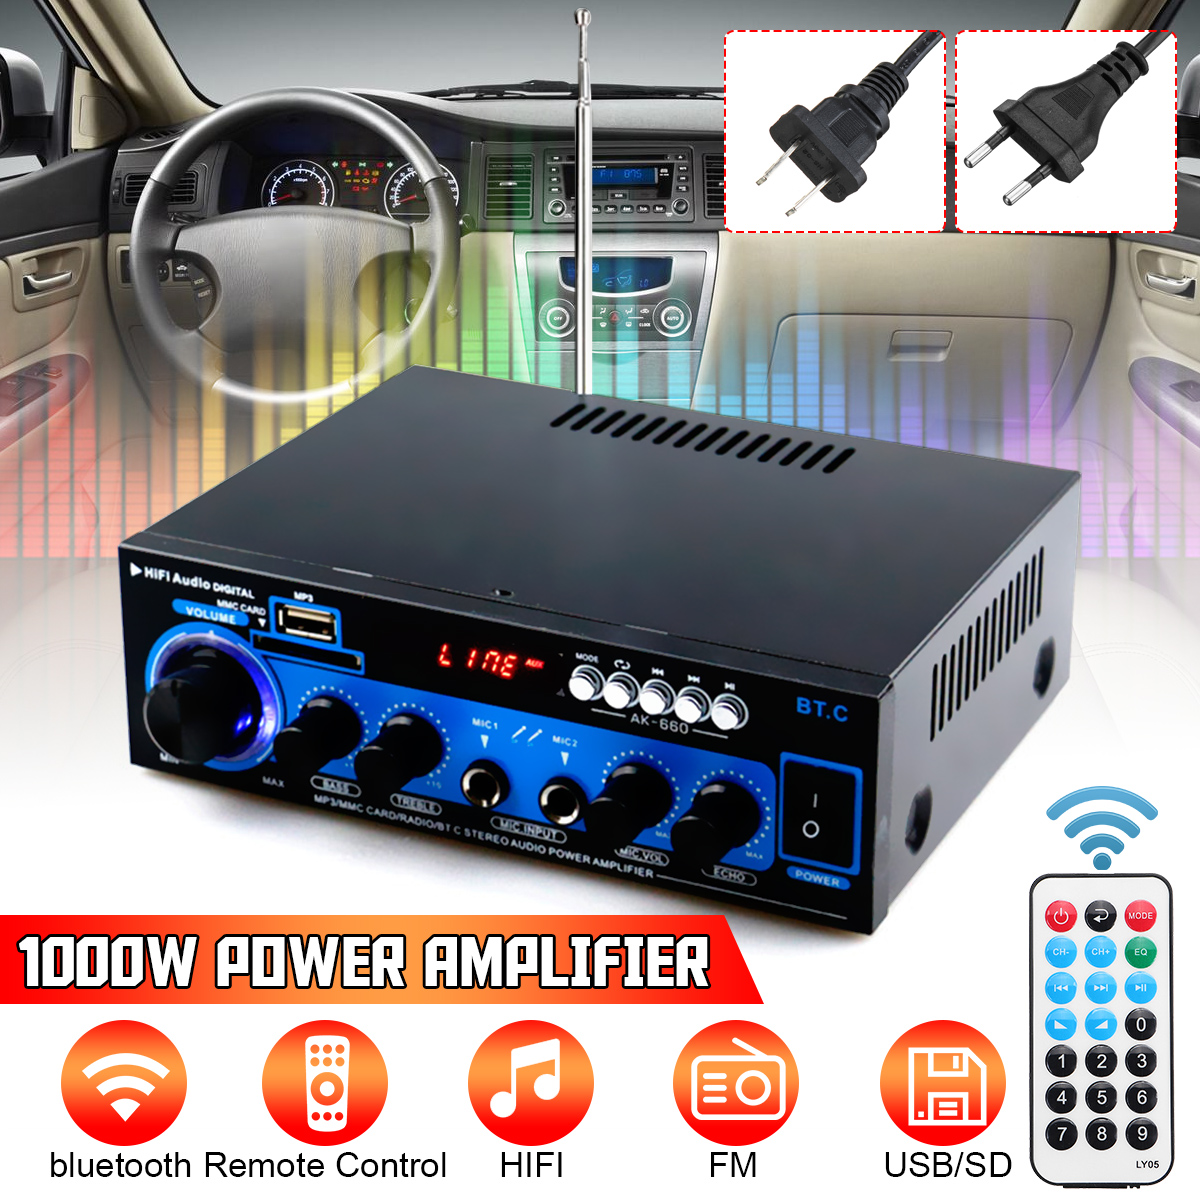 1000W 12V DC bluetooth Stereo LED Digital Amplifier HiFi USB SD Aux FM